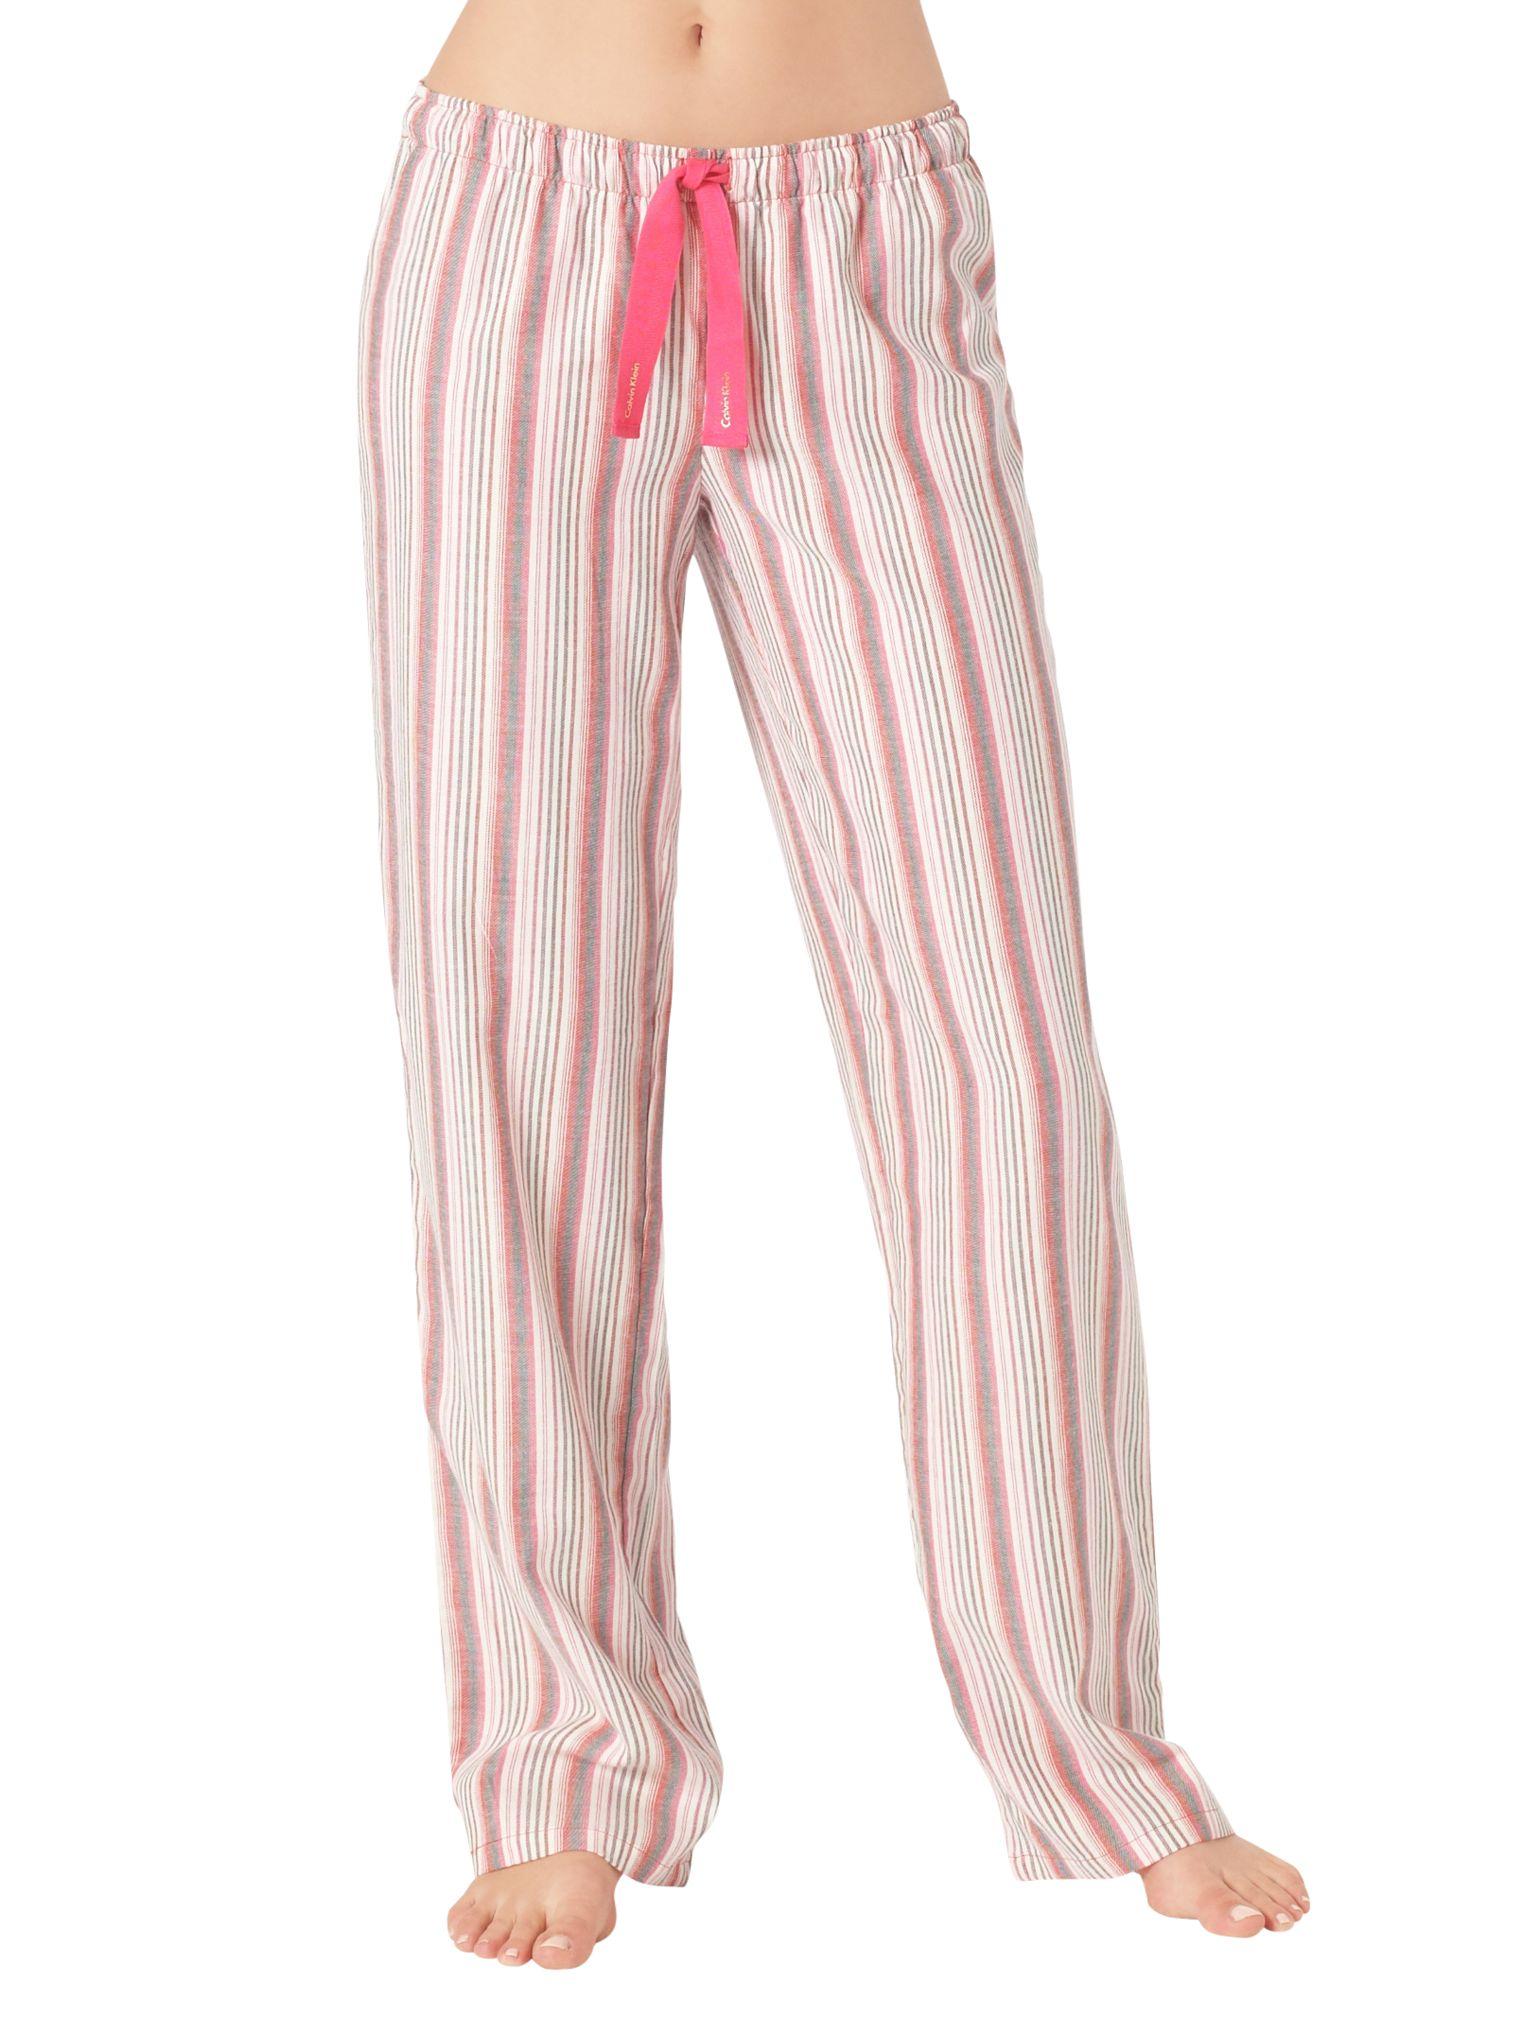 Calvin Klein Cabaret Stripe Pyjama Bottoms, Pink/Ivory